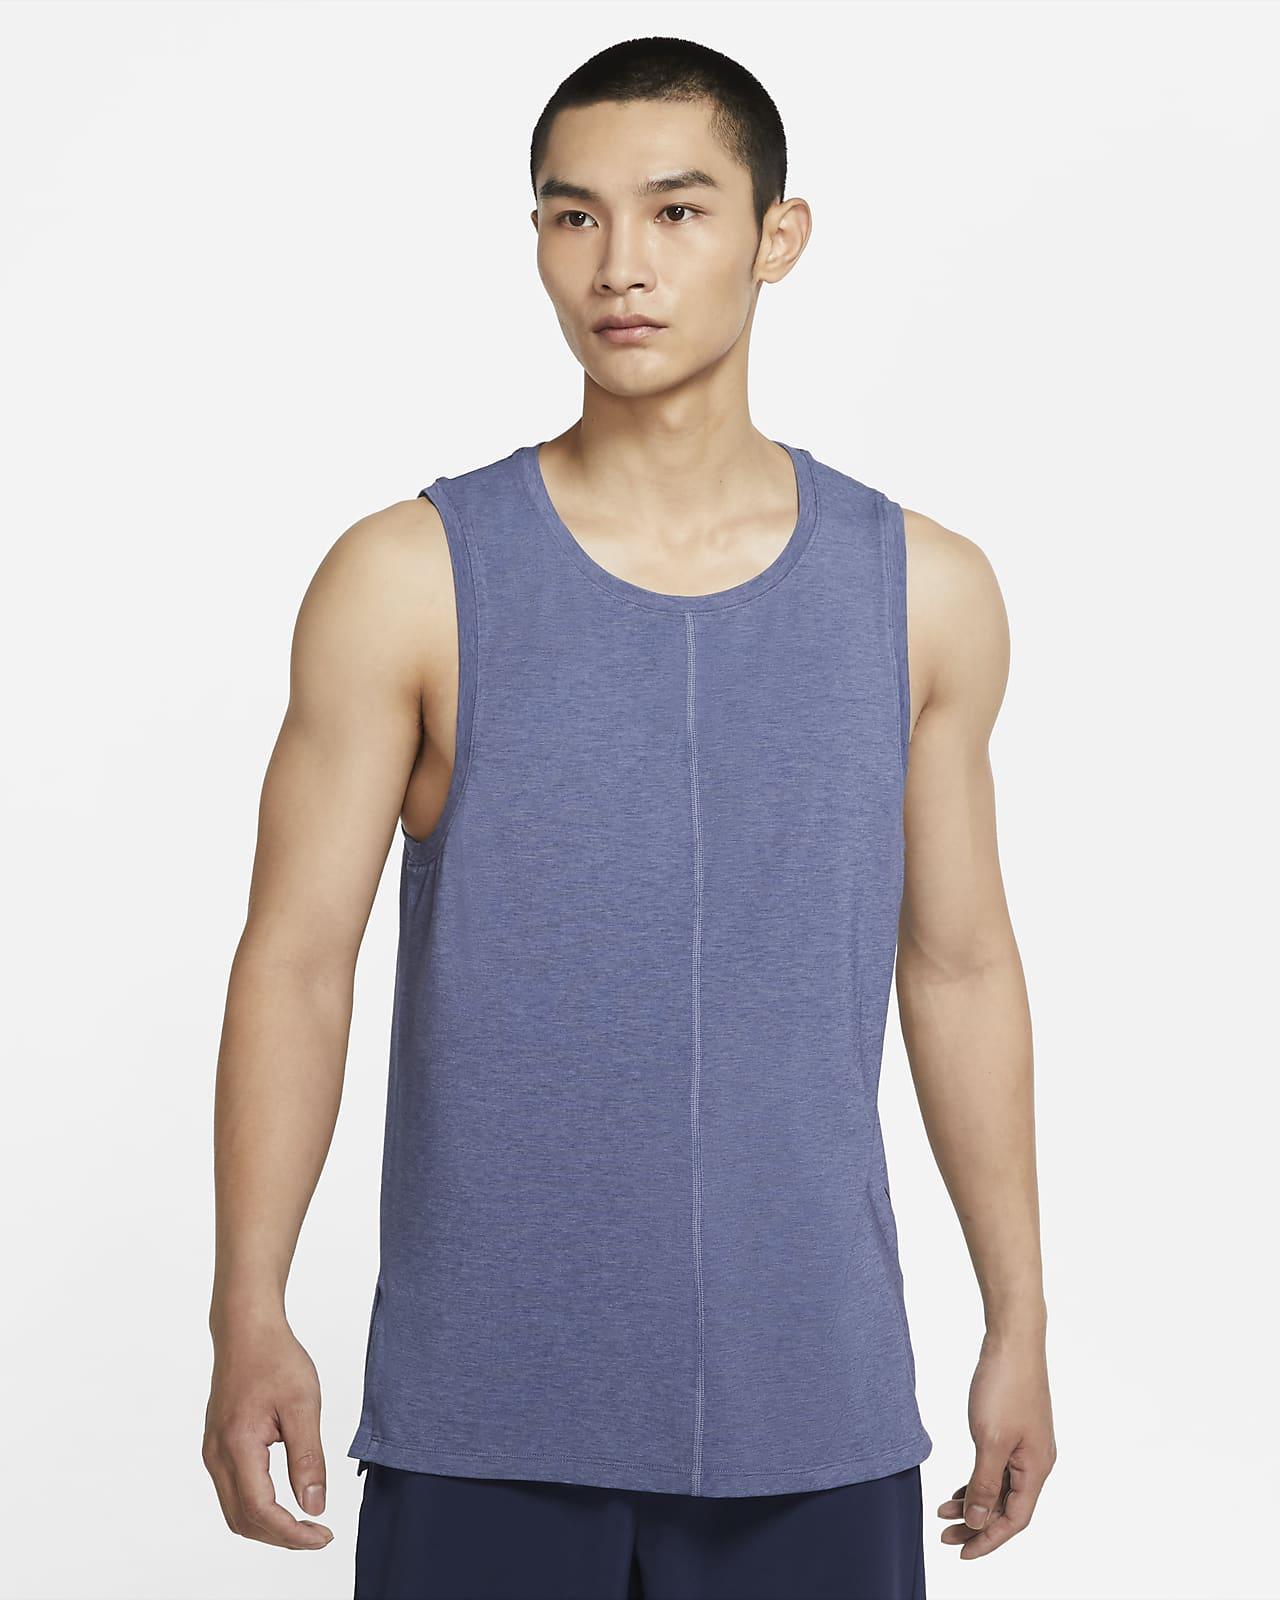 Nike Yoga 男子背心